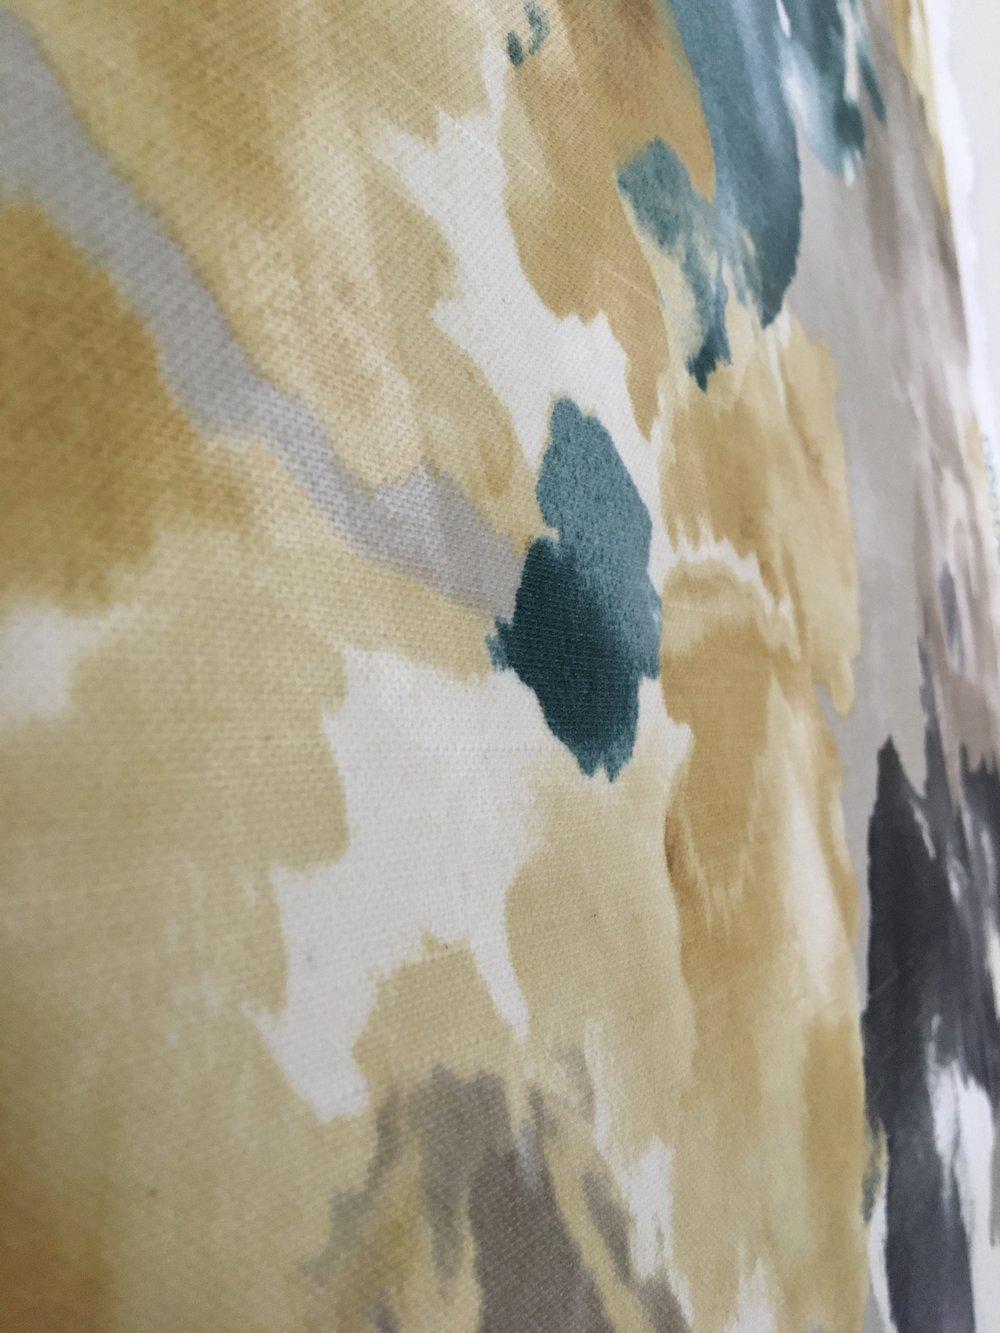 diy liquid starch fabric wallpaper how to